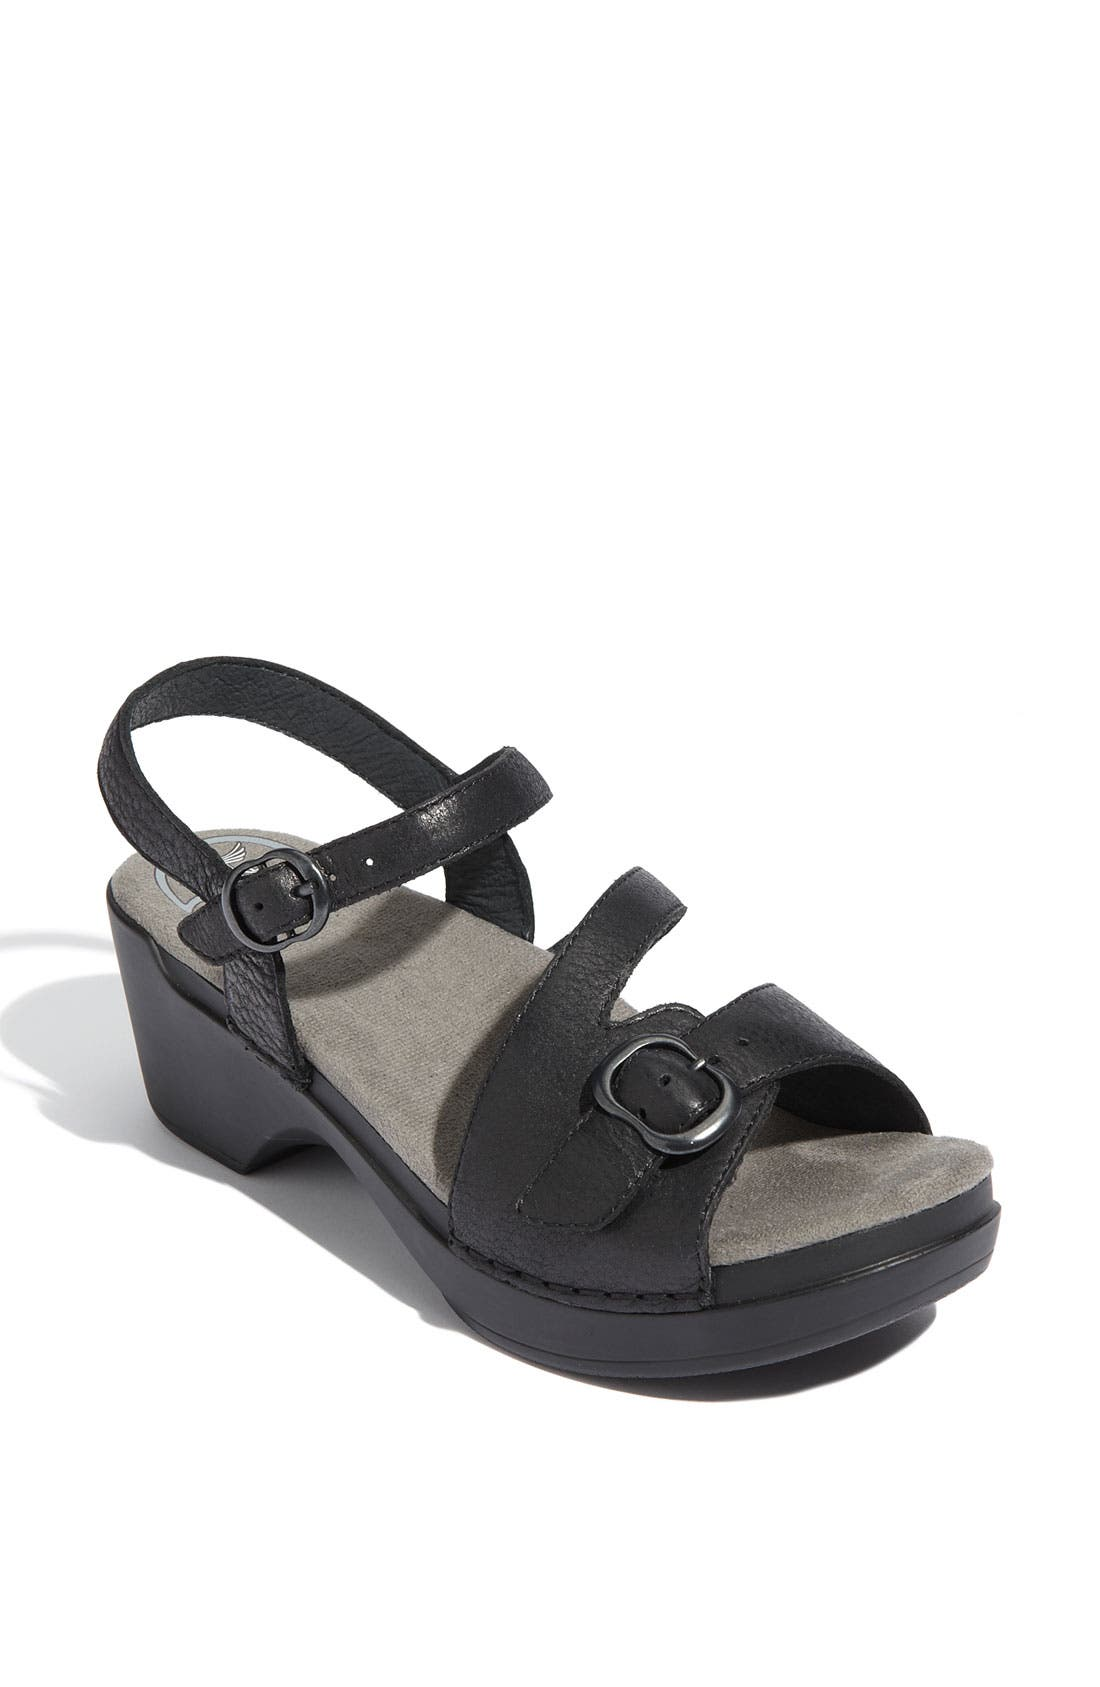 Alternate Image 1 Selected - Dansko 'Sandi' Clog Sandal